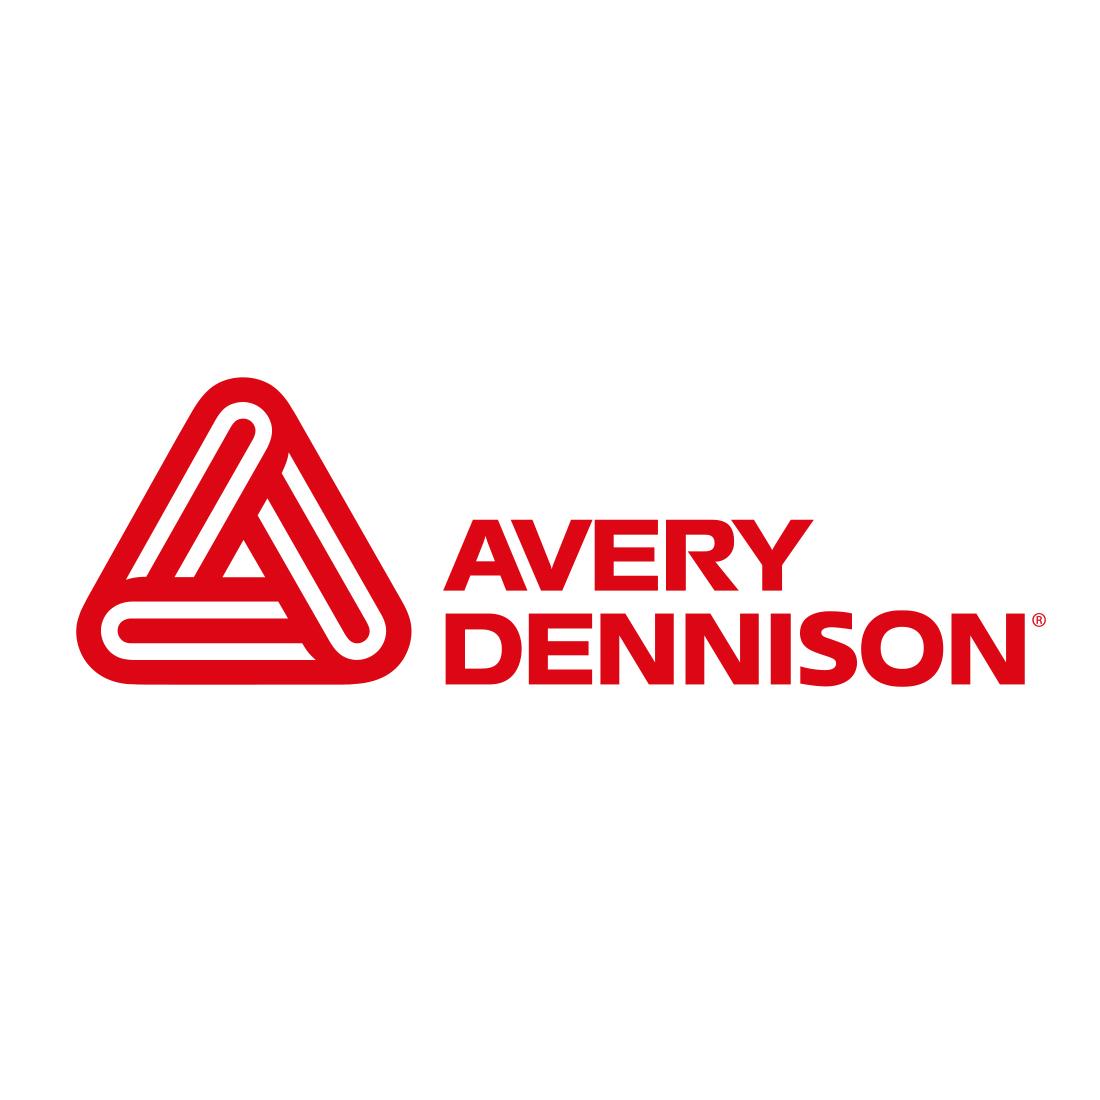 Avery Dennison 5300 Blockout Film